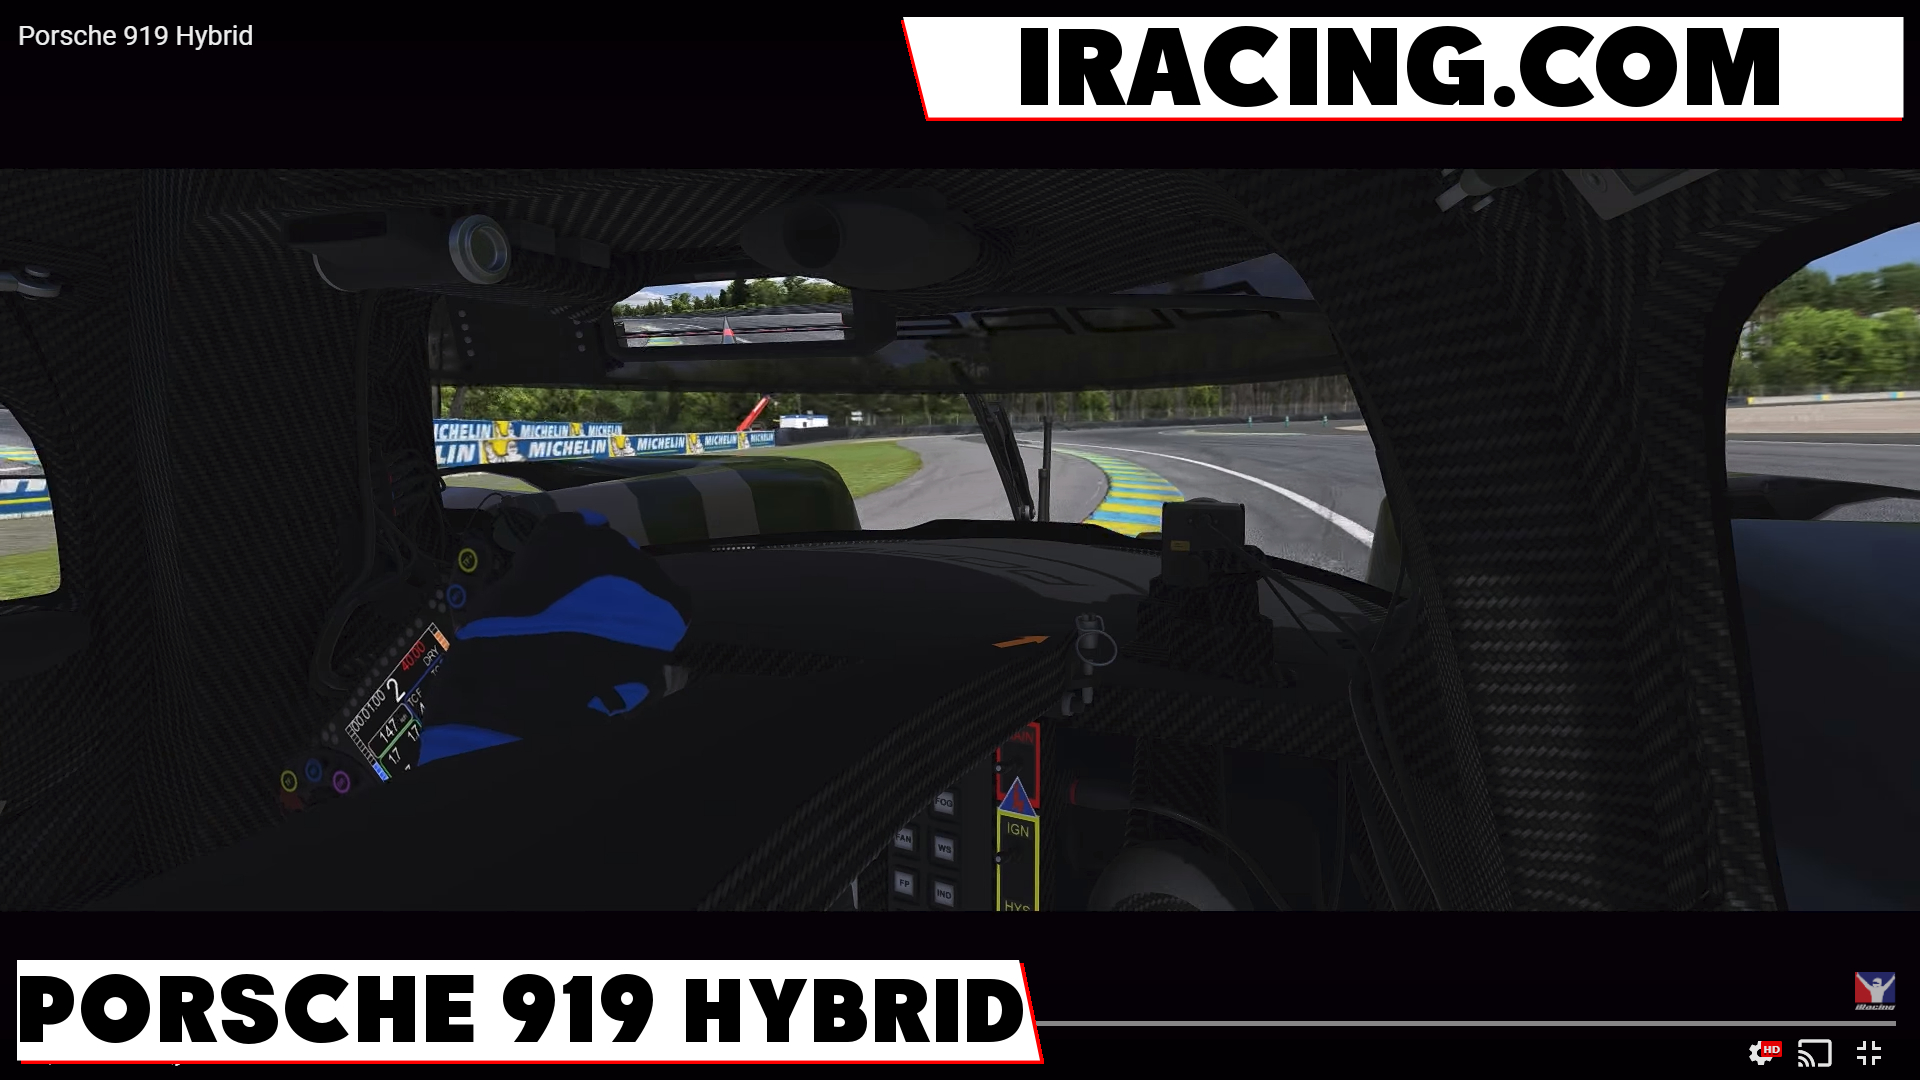 iRacing Porsche 919 Hybrid - Pitlanes Sim Racing